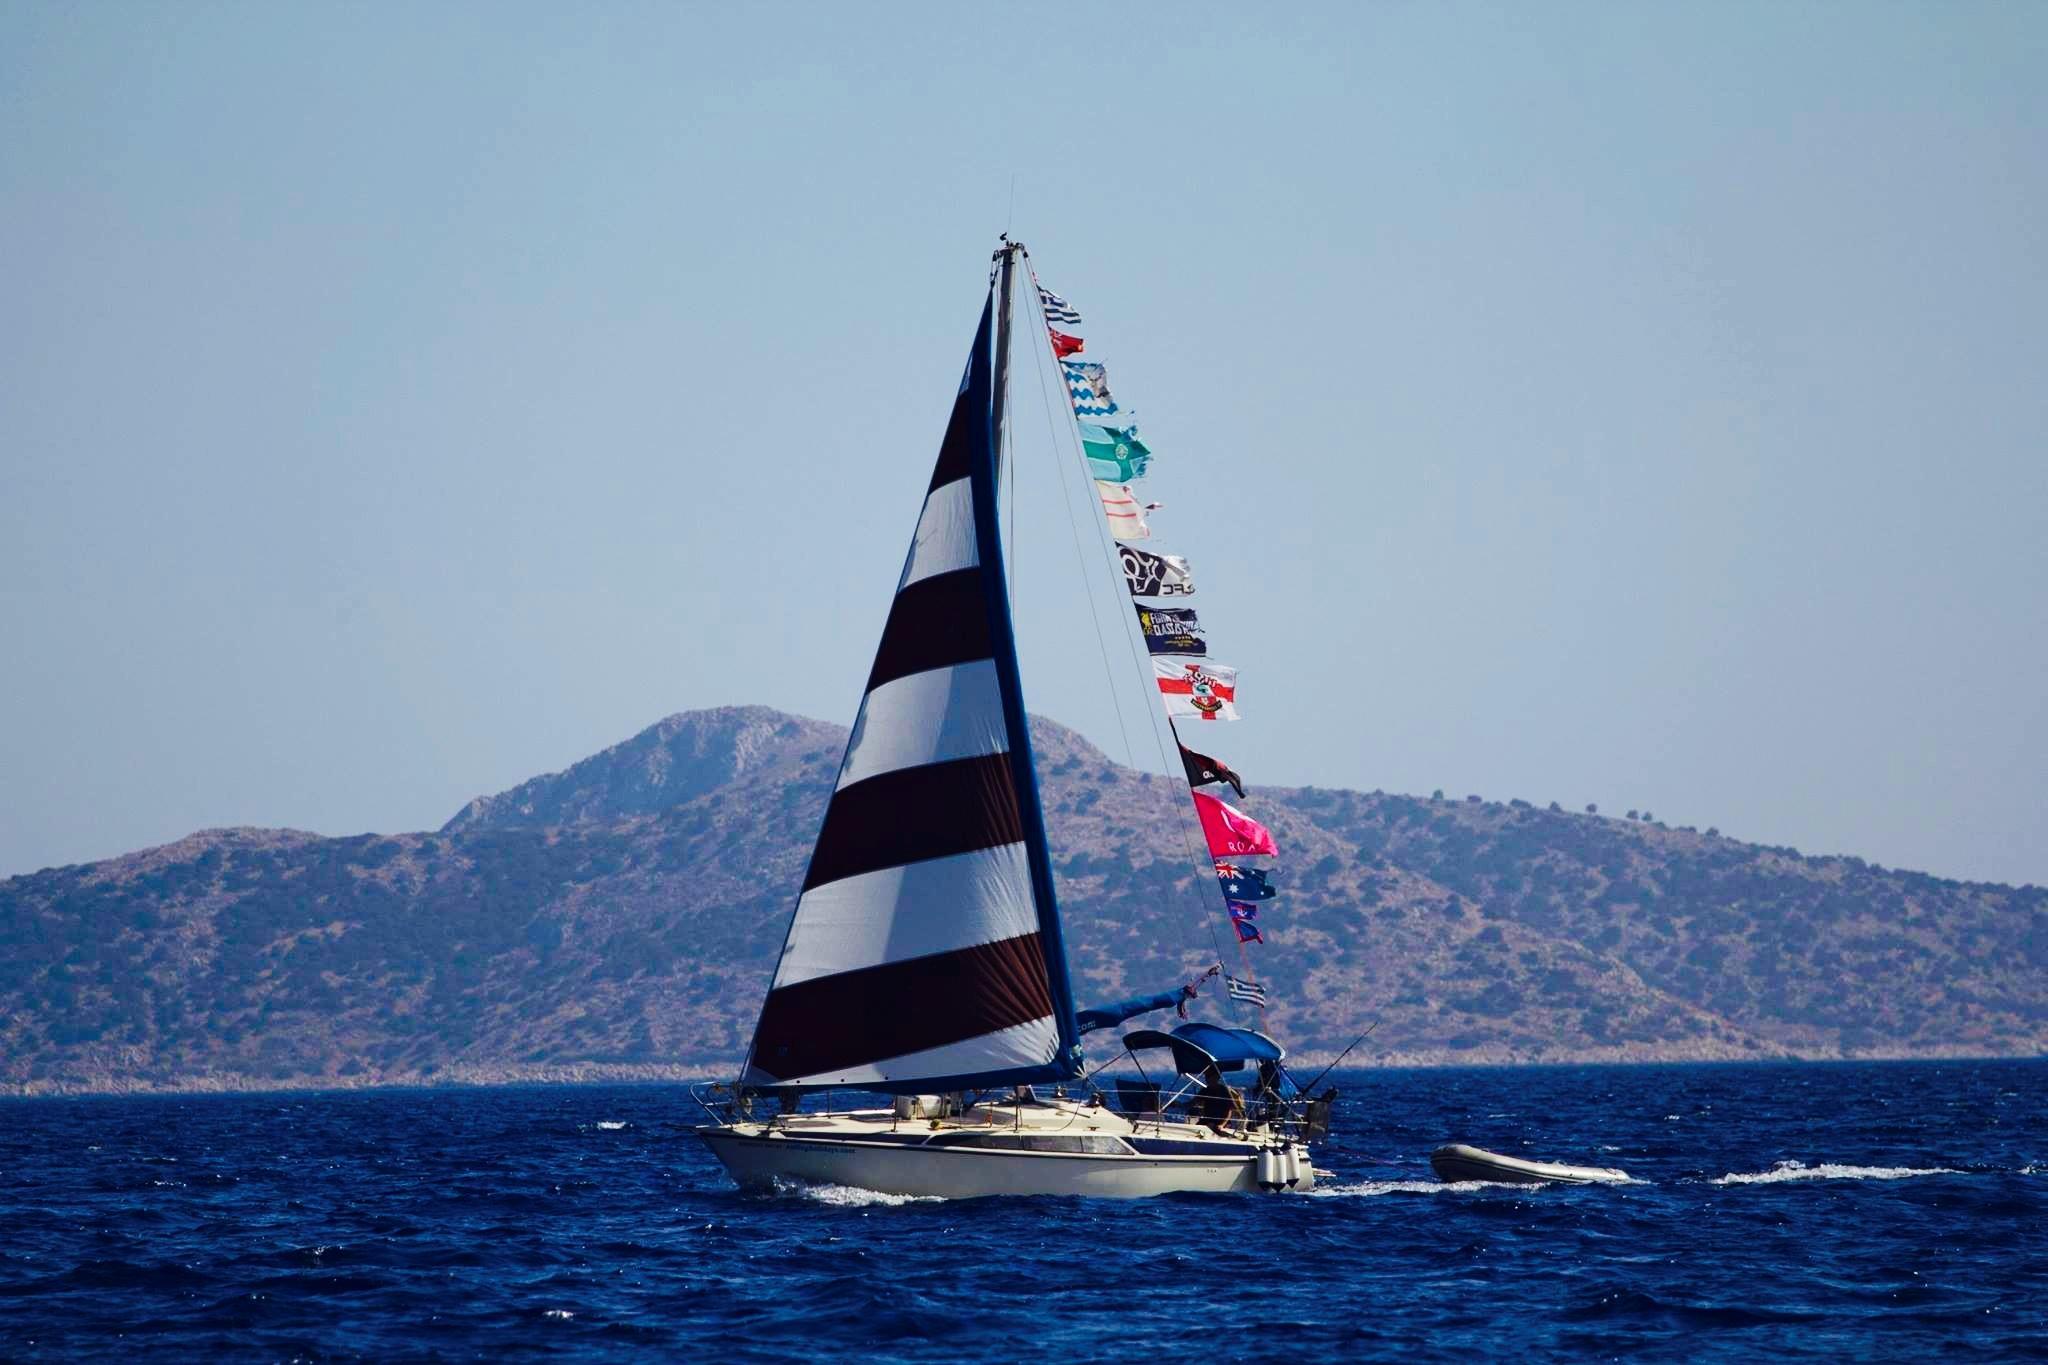 Lead Boat Sirocco Sailing